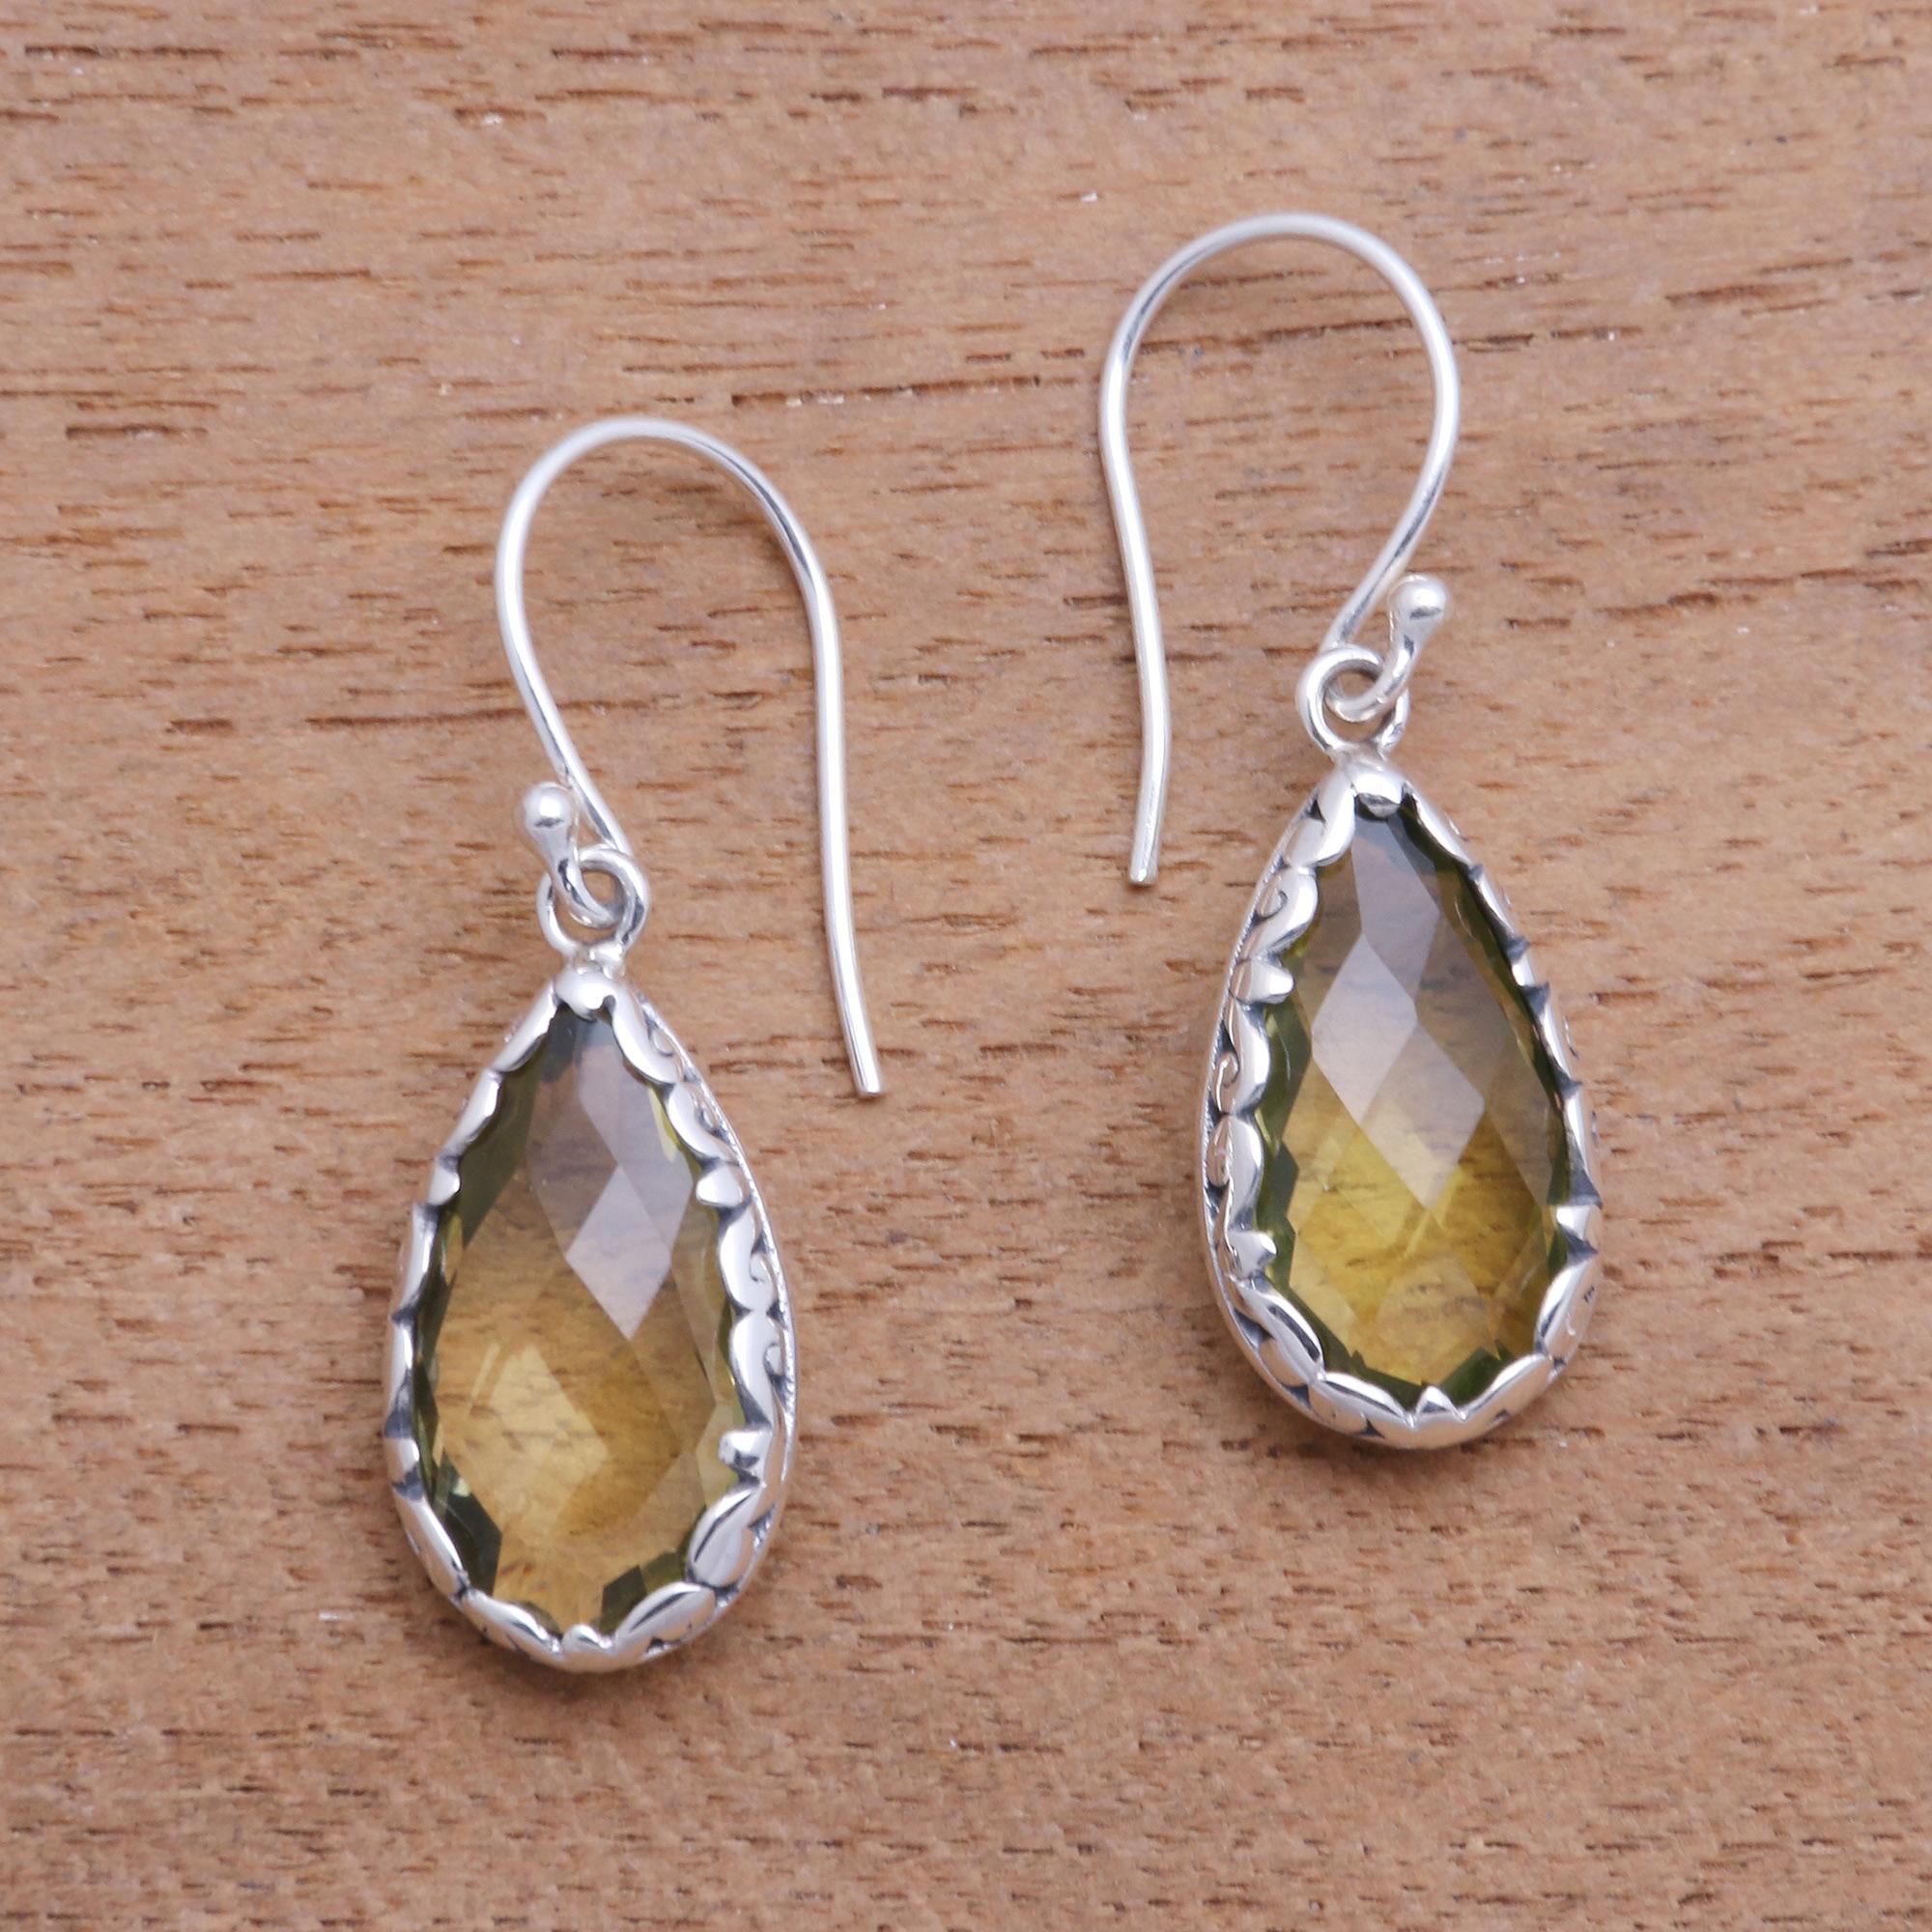 6 Carat Yellow Quartz Dangle Earrings From Bali Lemon Dew